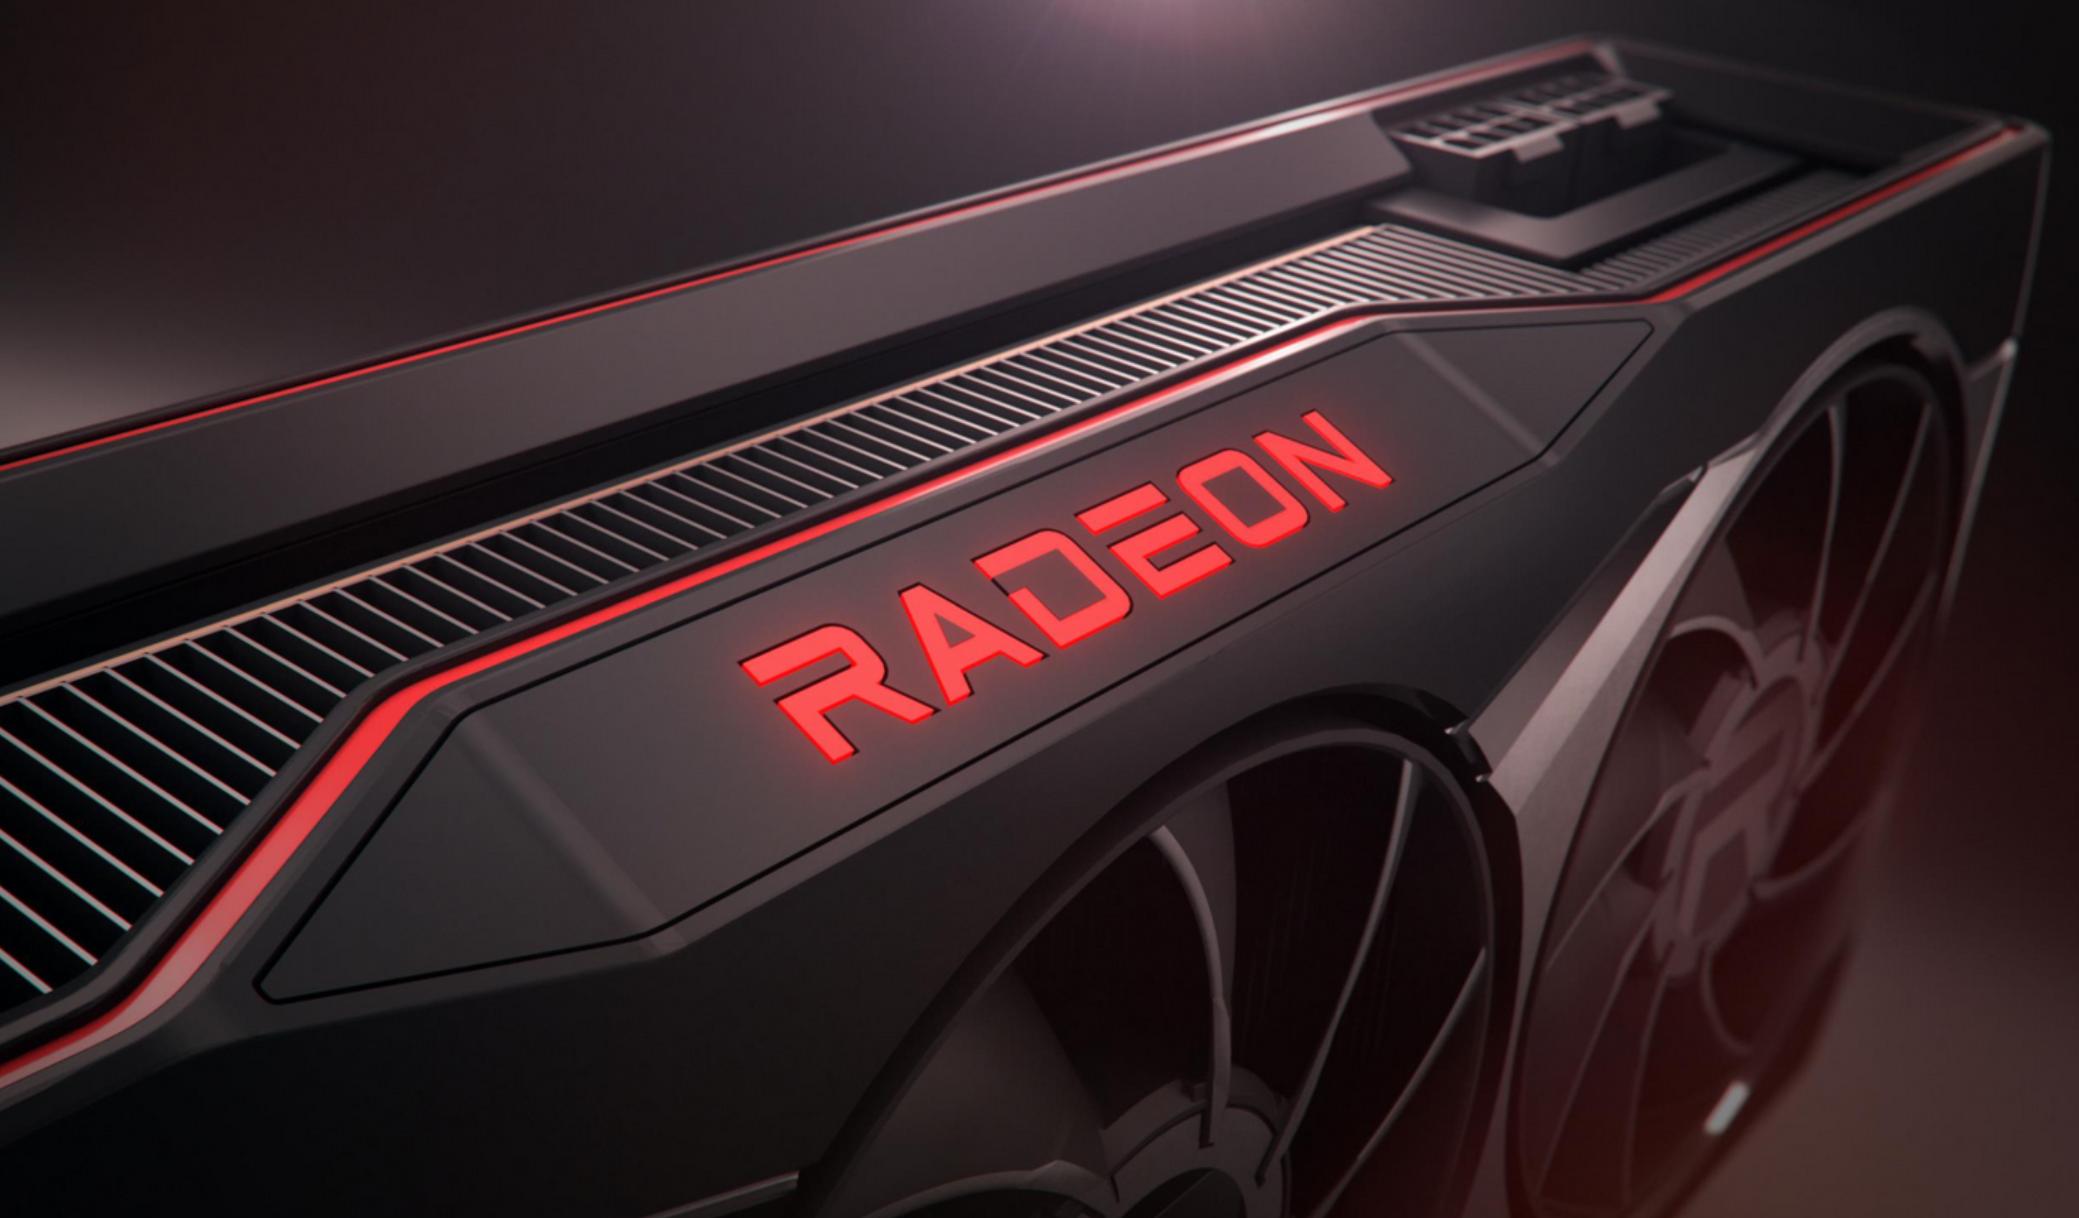 AMD发布会综述:Zen 3远离性价比,新显卡让人期待